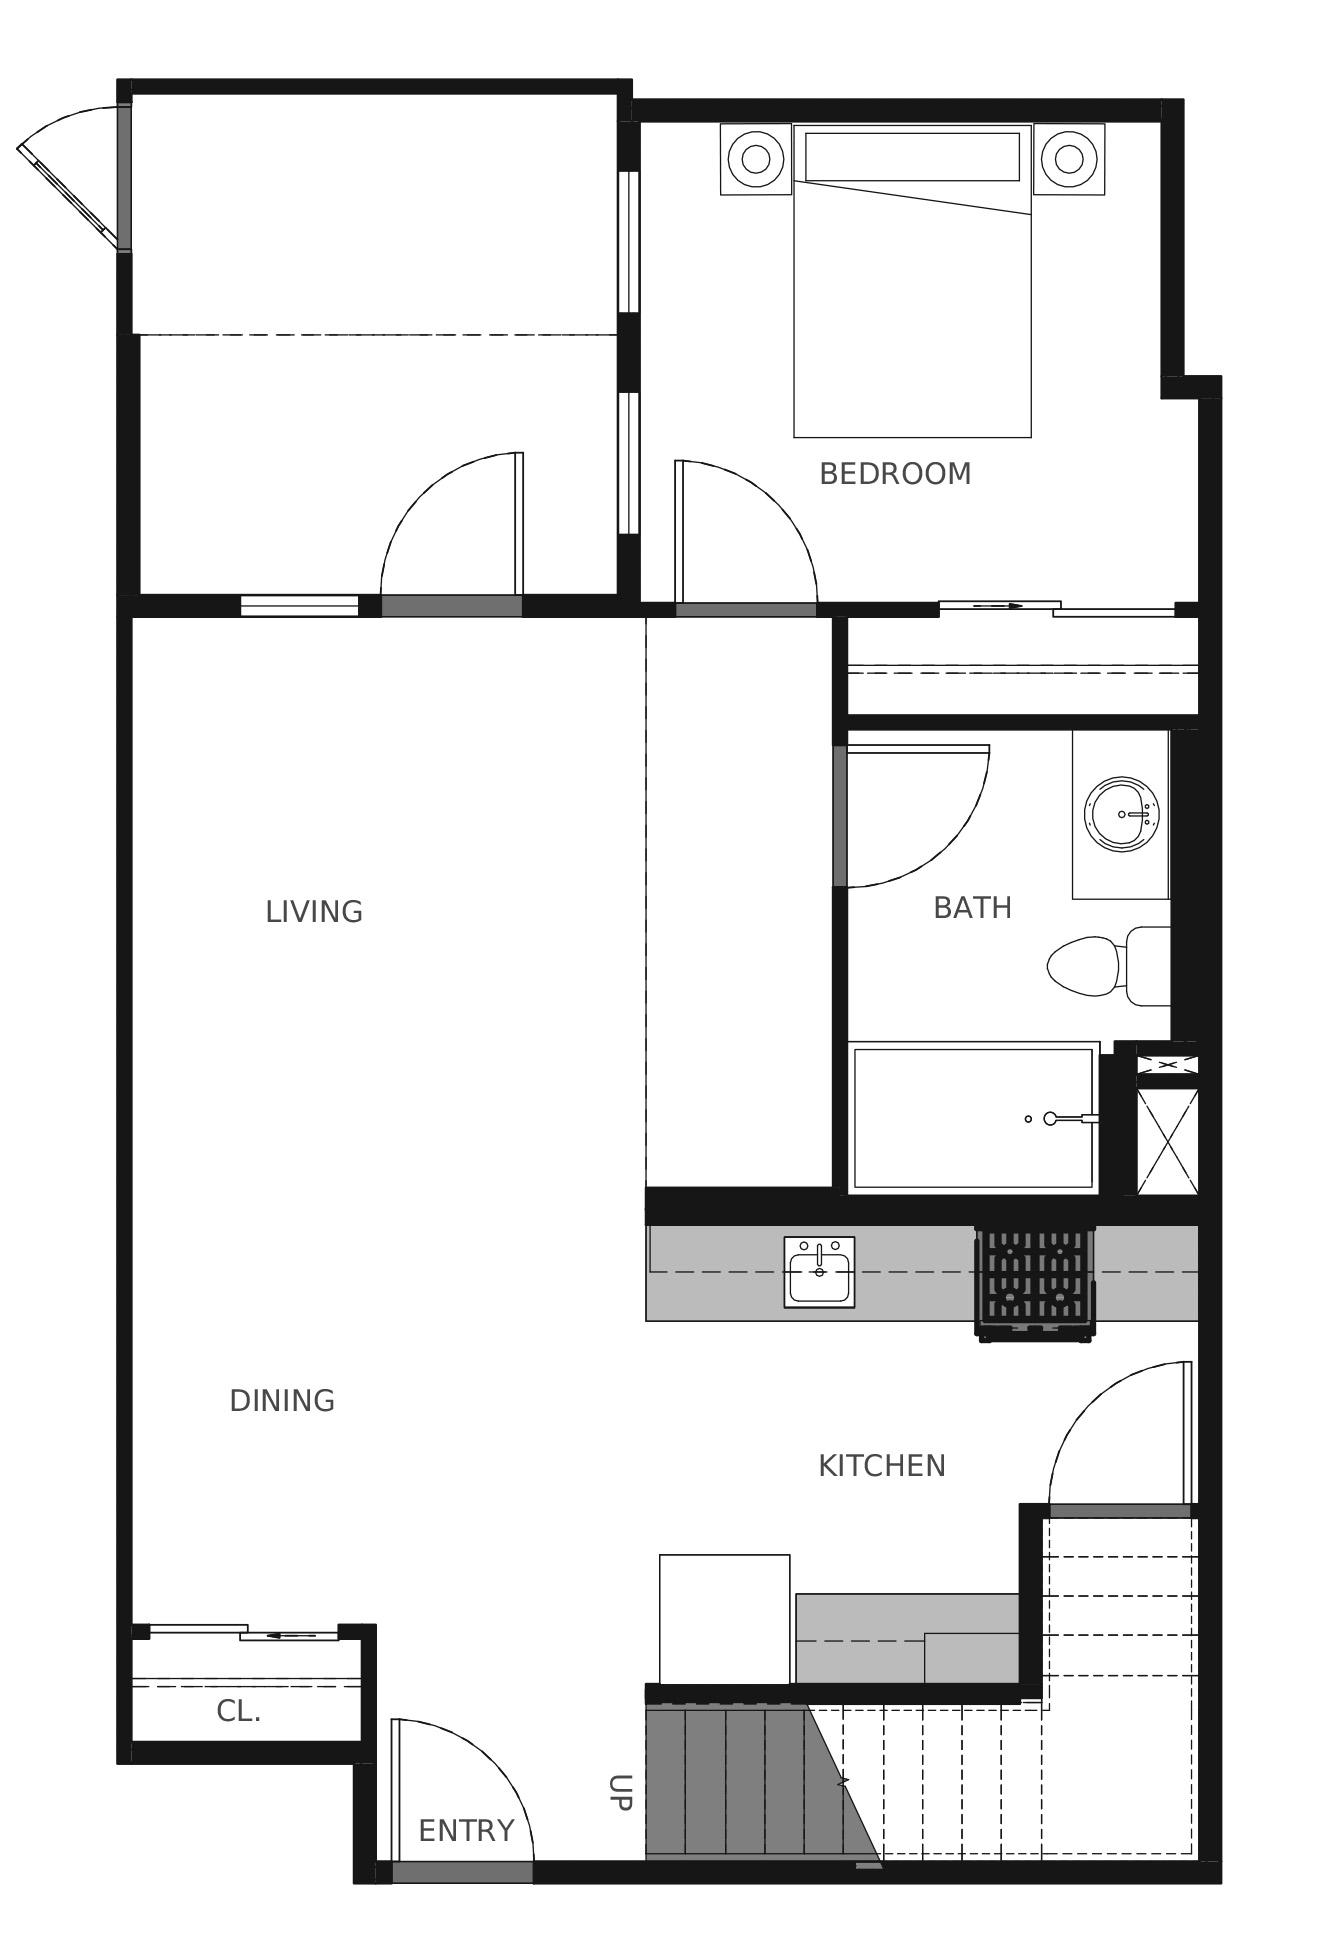 Plan C4b First Floor - 1,356 sq. ft.